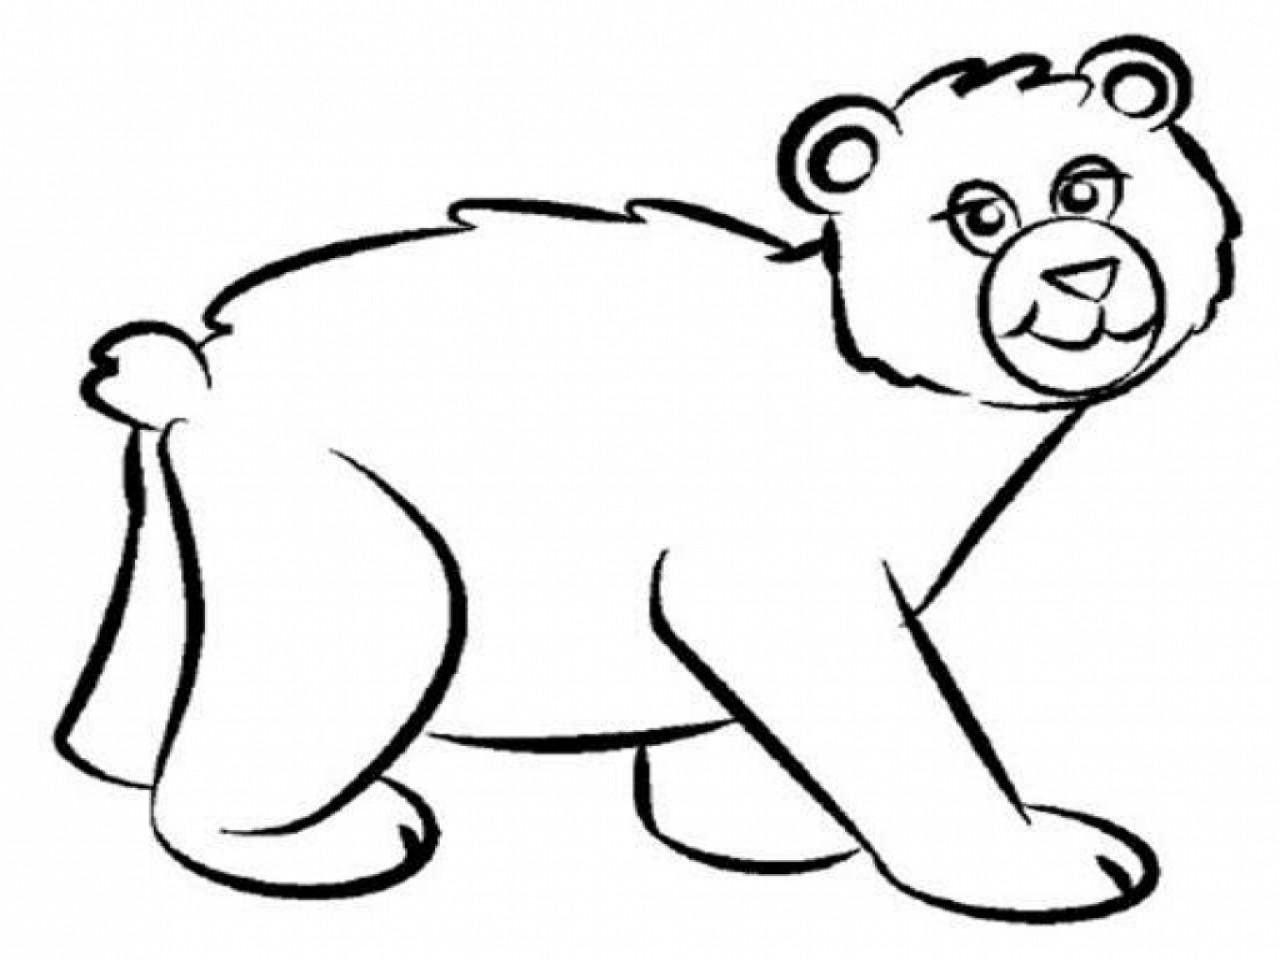 Brown Bear Brown Bear Coloring Pages  Brown Bear Coloring Pages Coloringsuite grig3